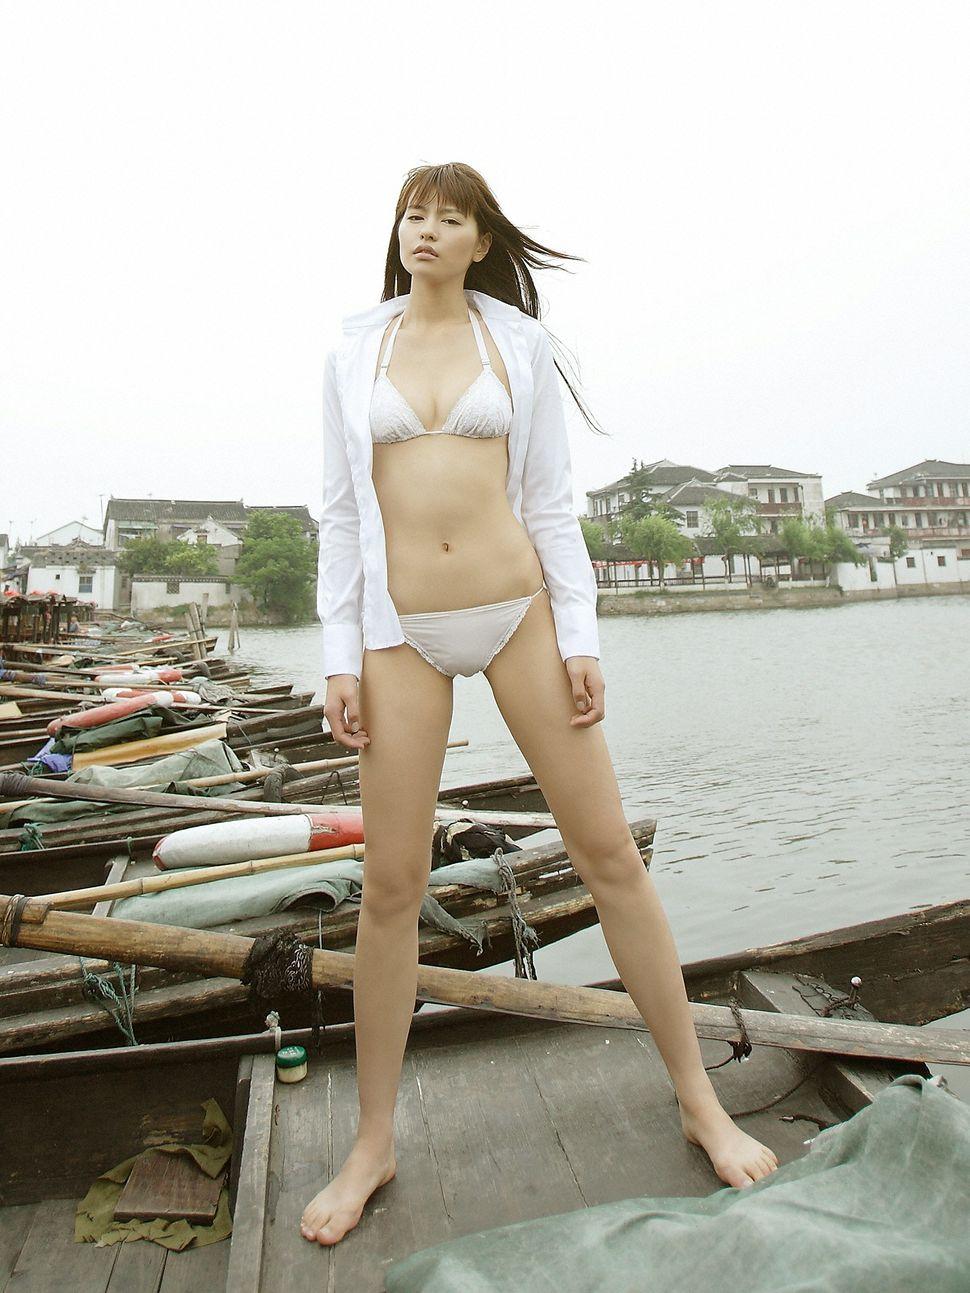 http://file.embraer170.blog.shinobi.jp/20101127syur2big11.jpg